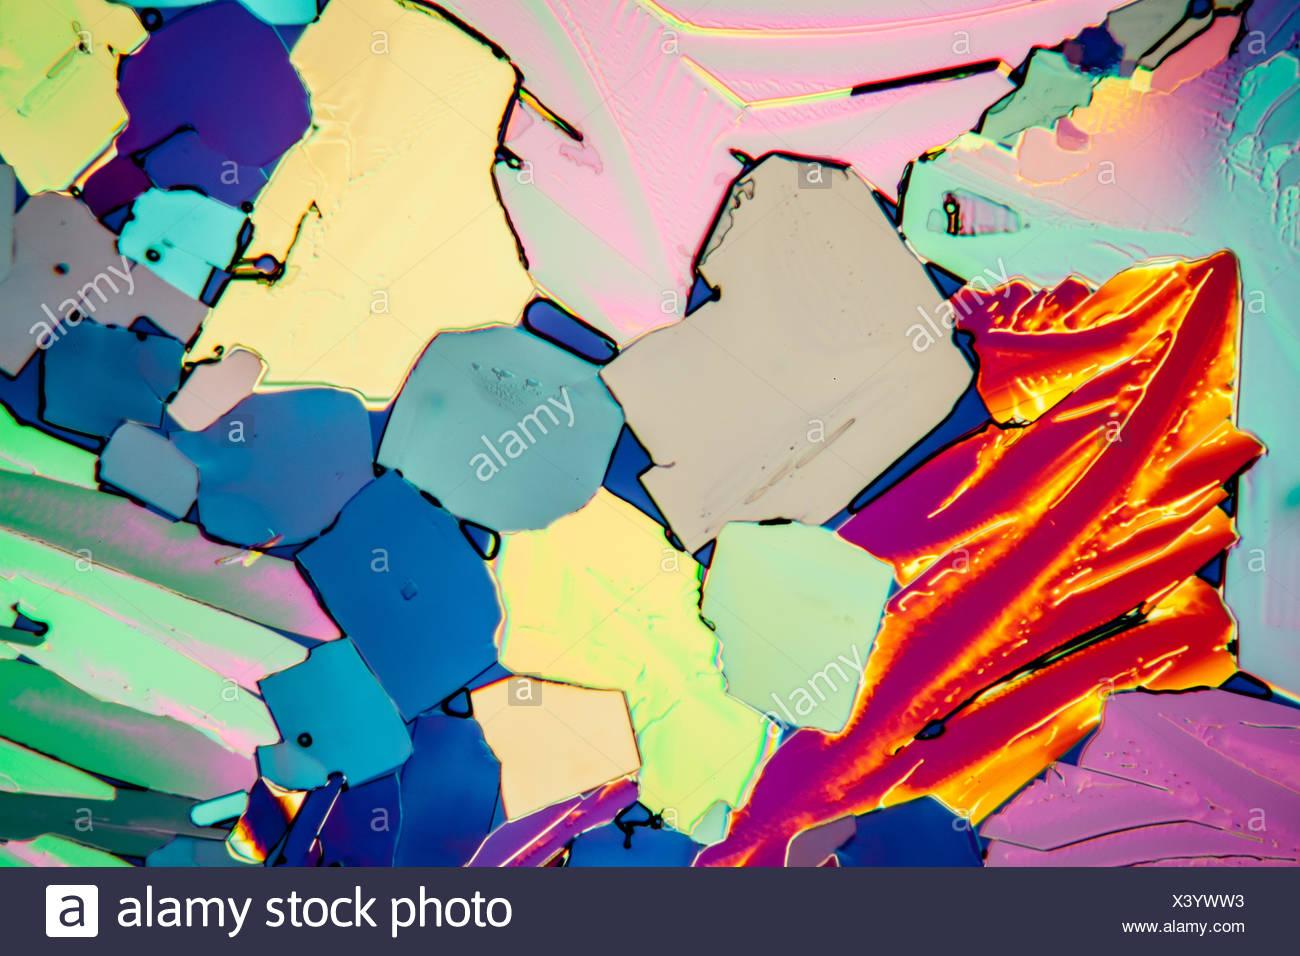 urea crystals - Stock Image